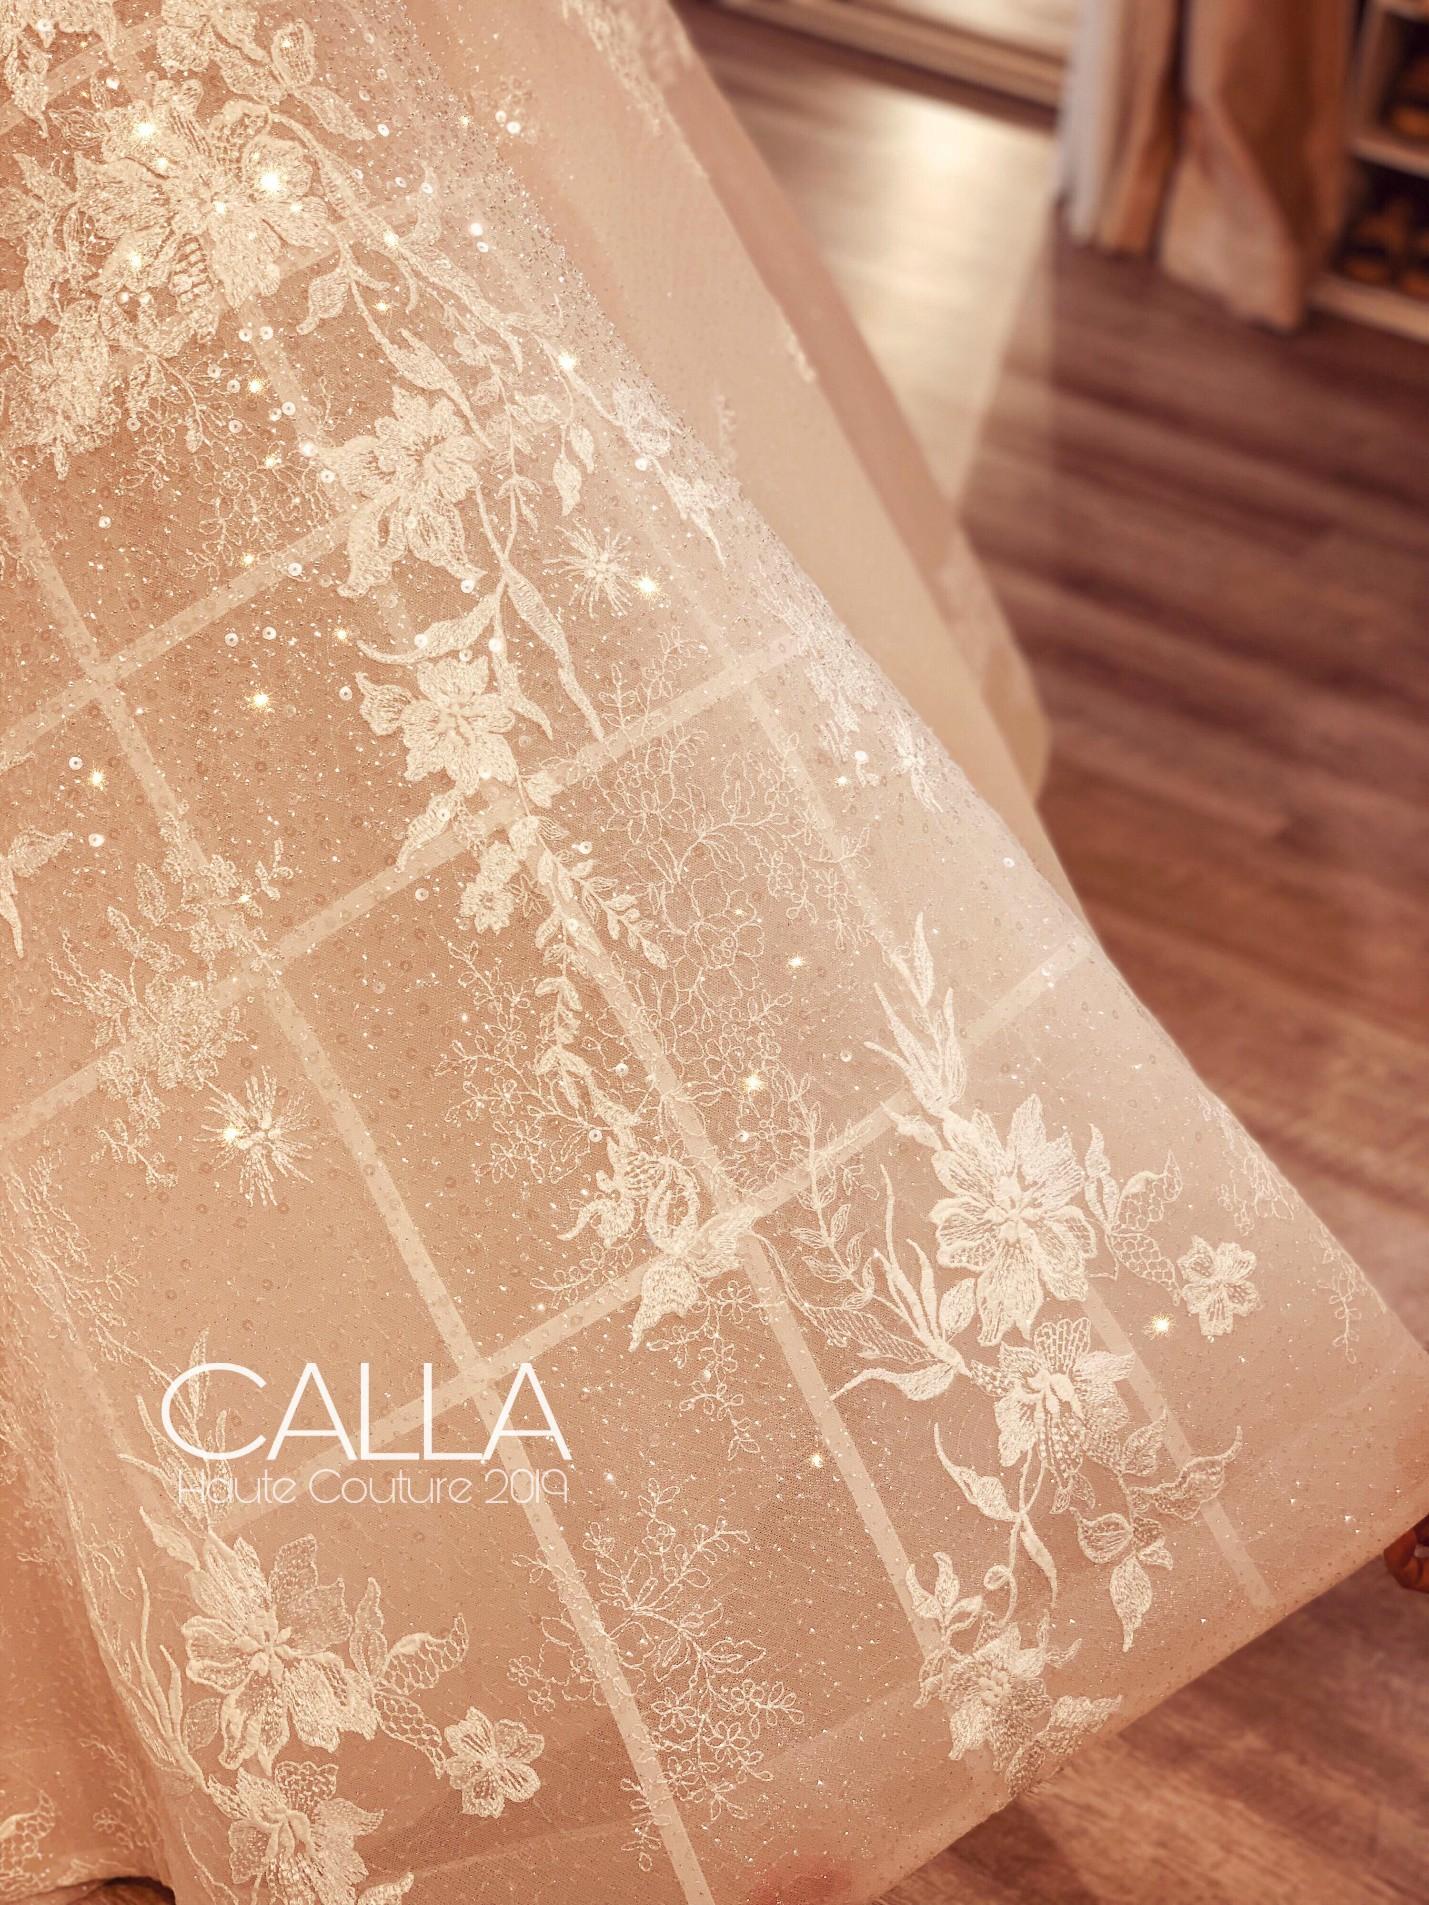 Calla Bridal ra mắt dòng sản phẩm cao cấp Calla Haute Couture 2019 - Ảnh 2.